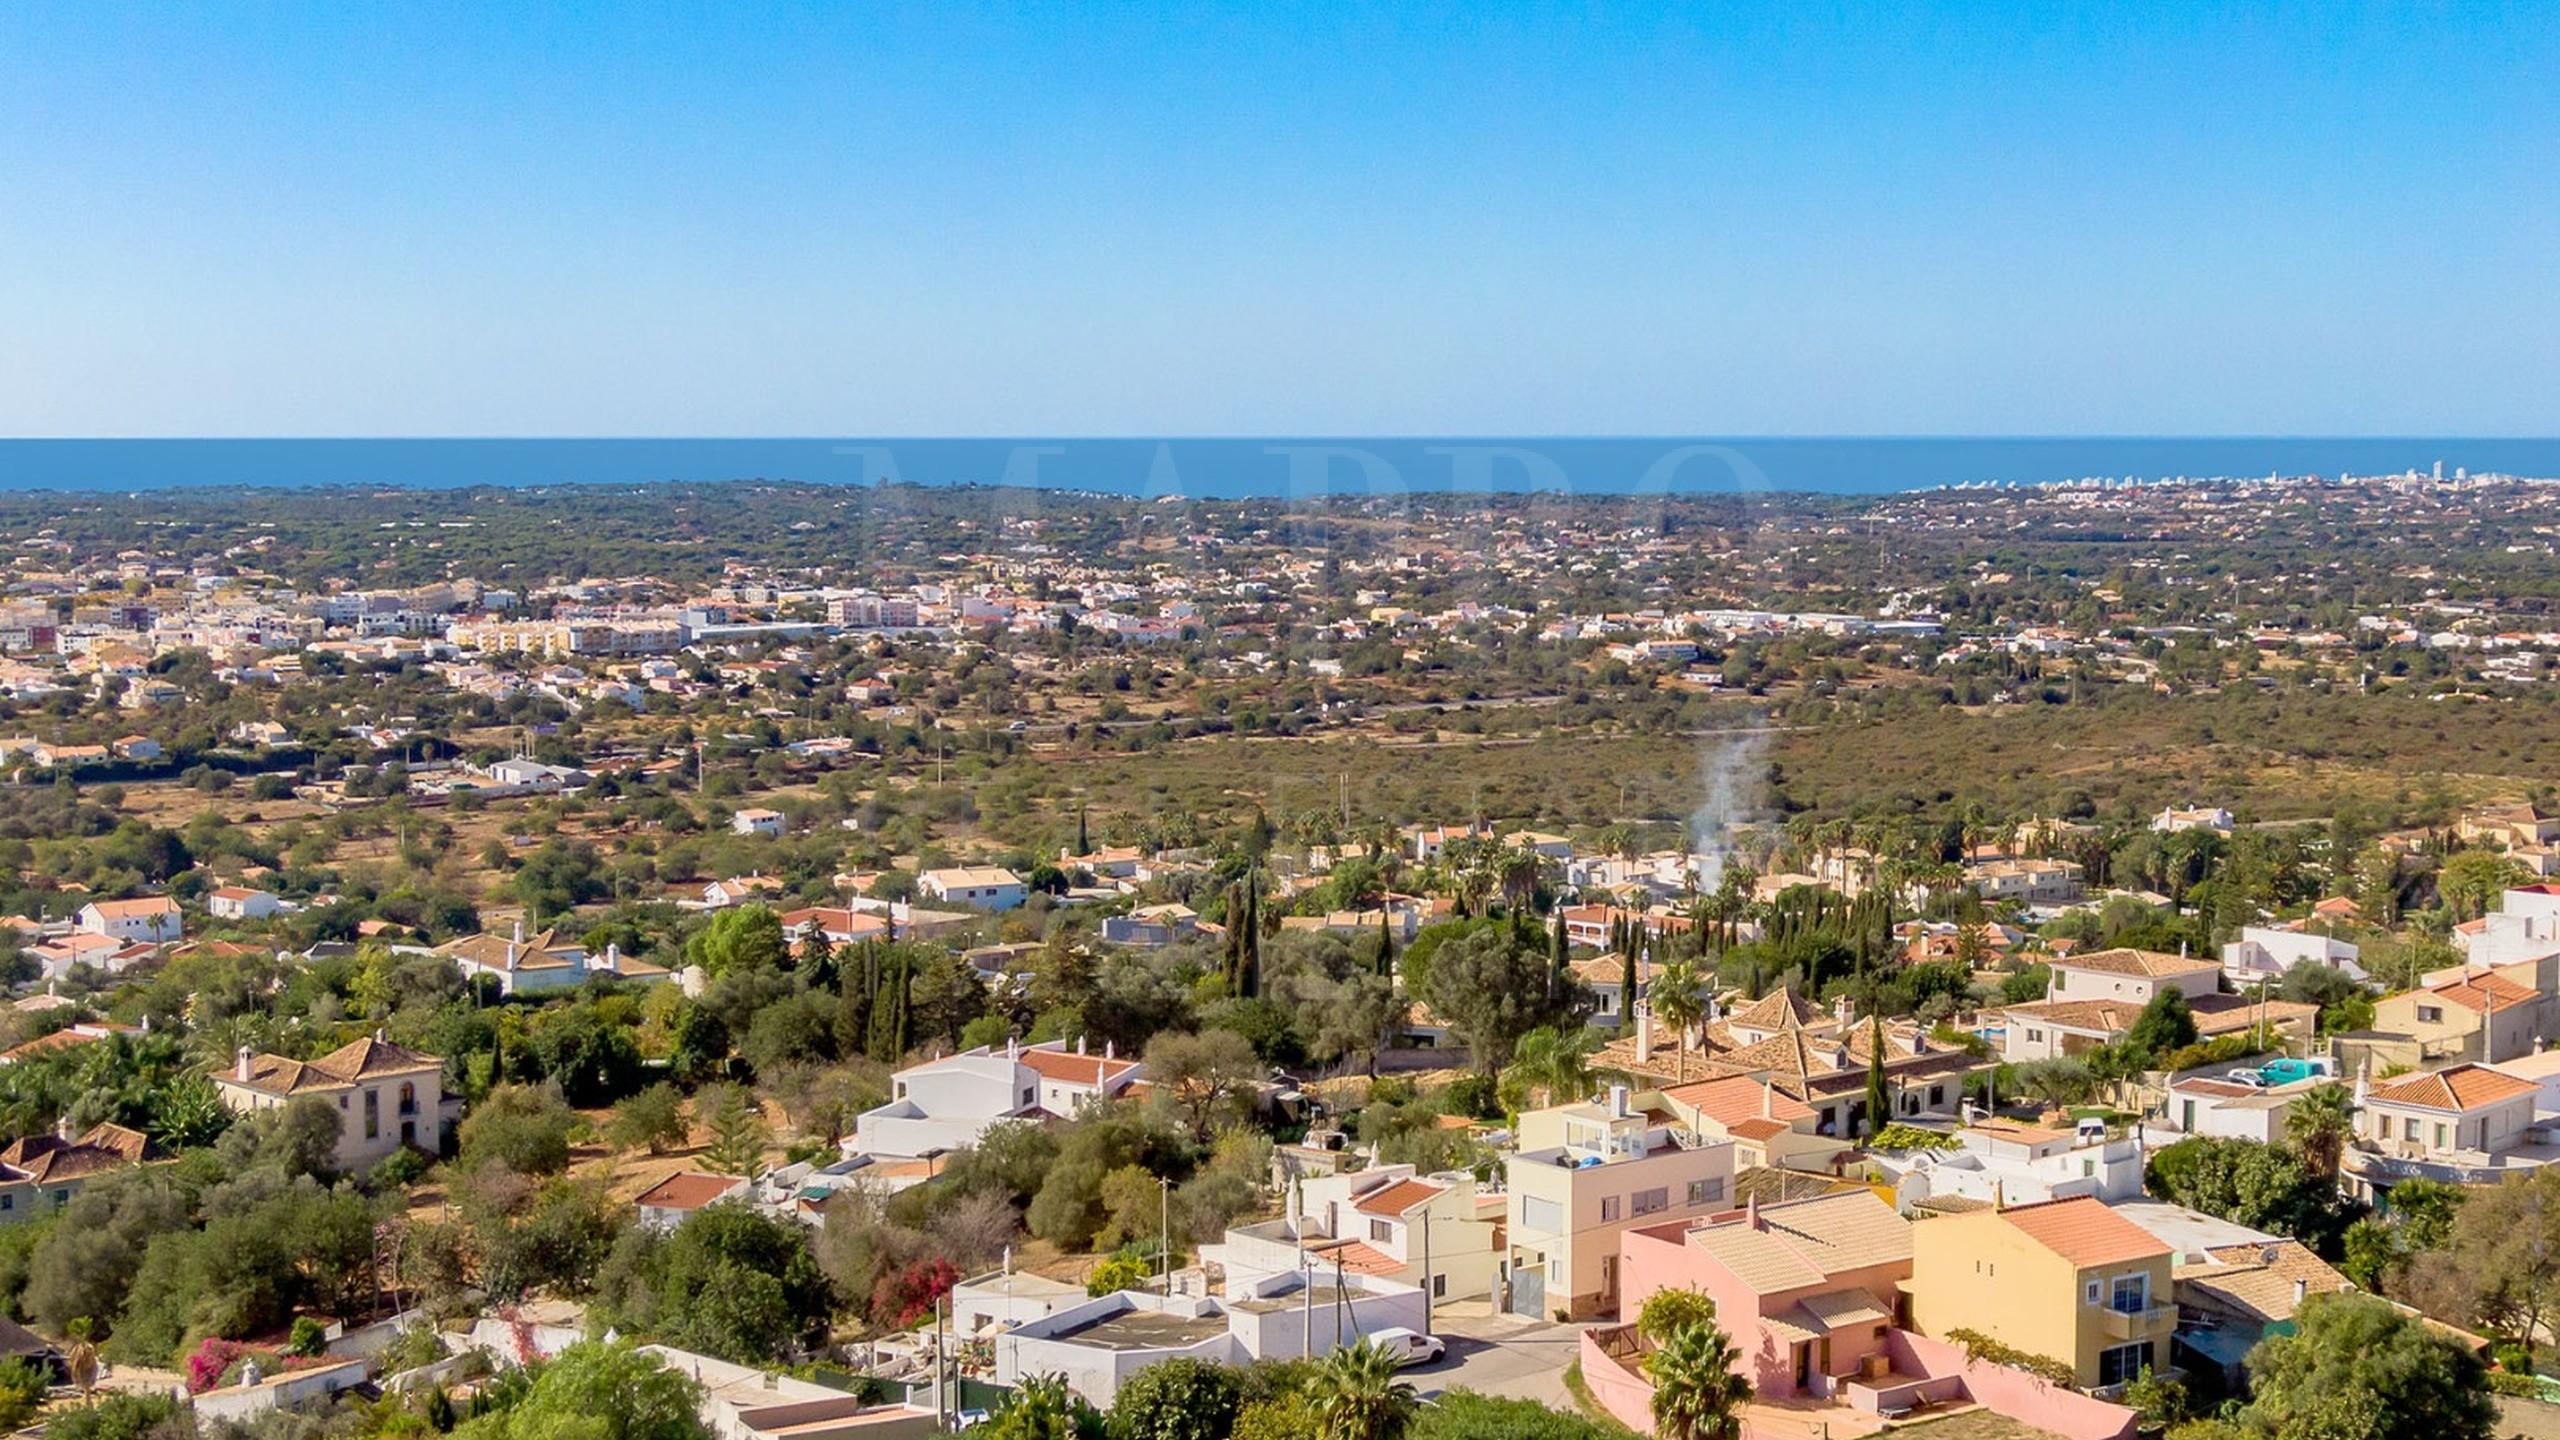 Plot of land for construction for sale near Faro, Algarve